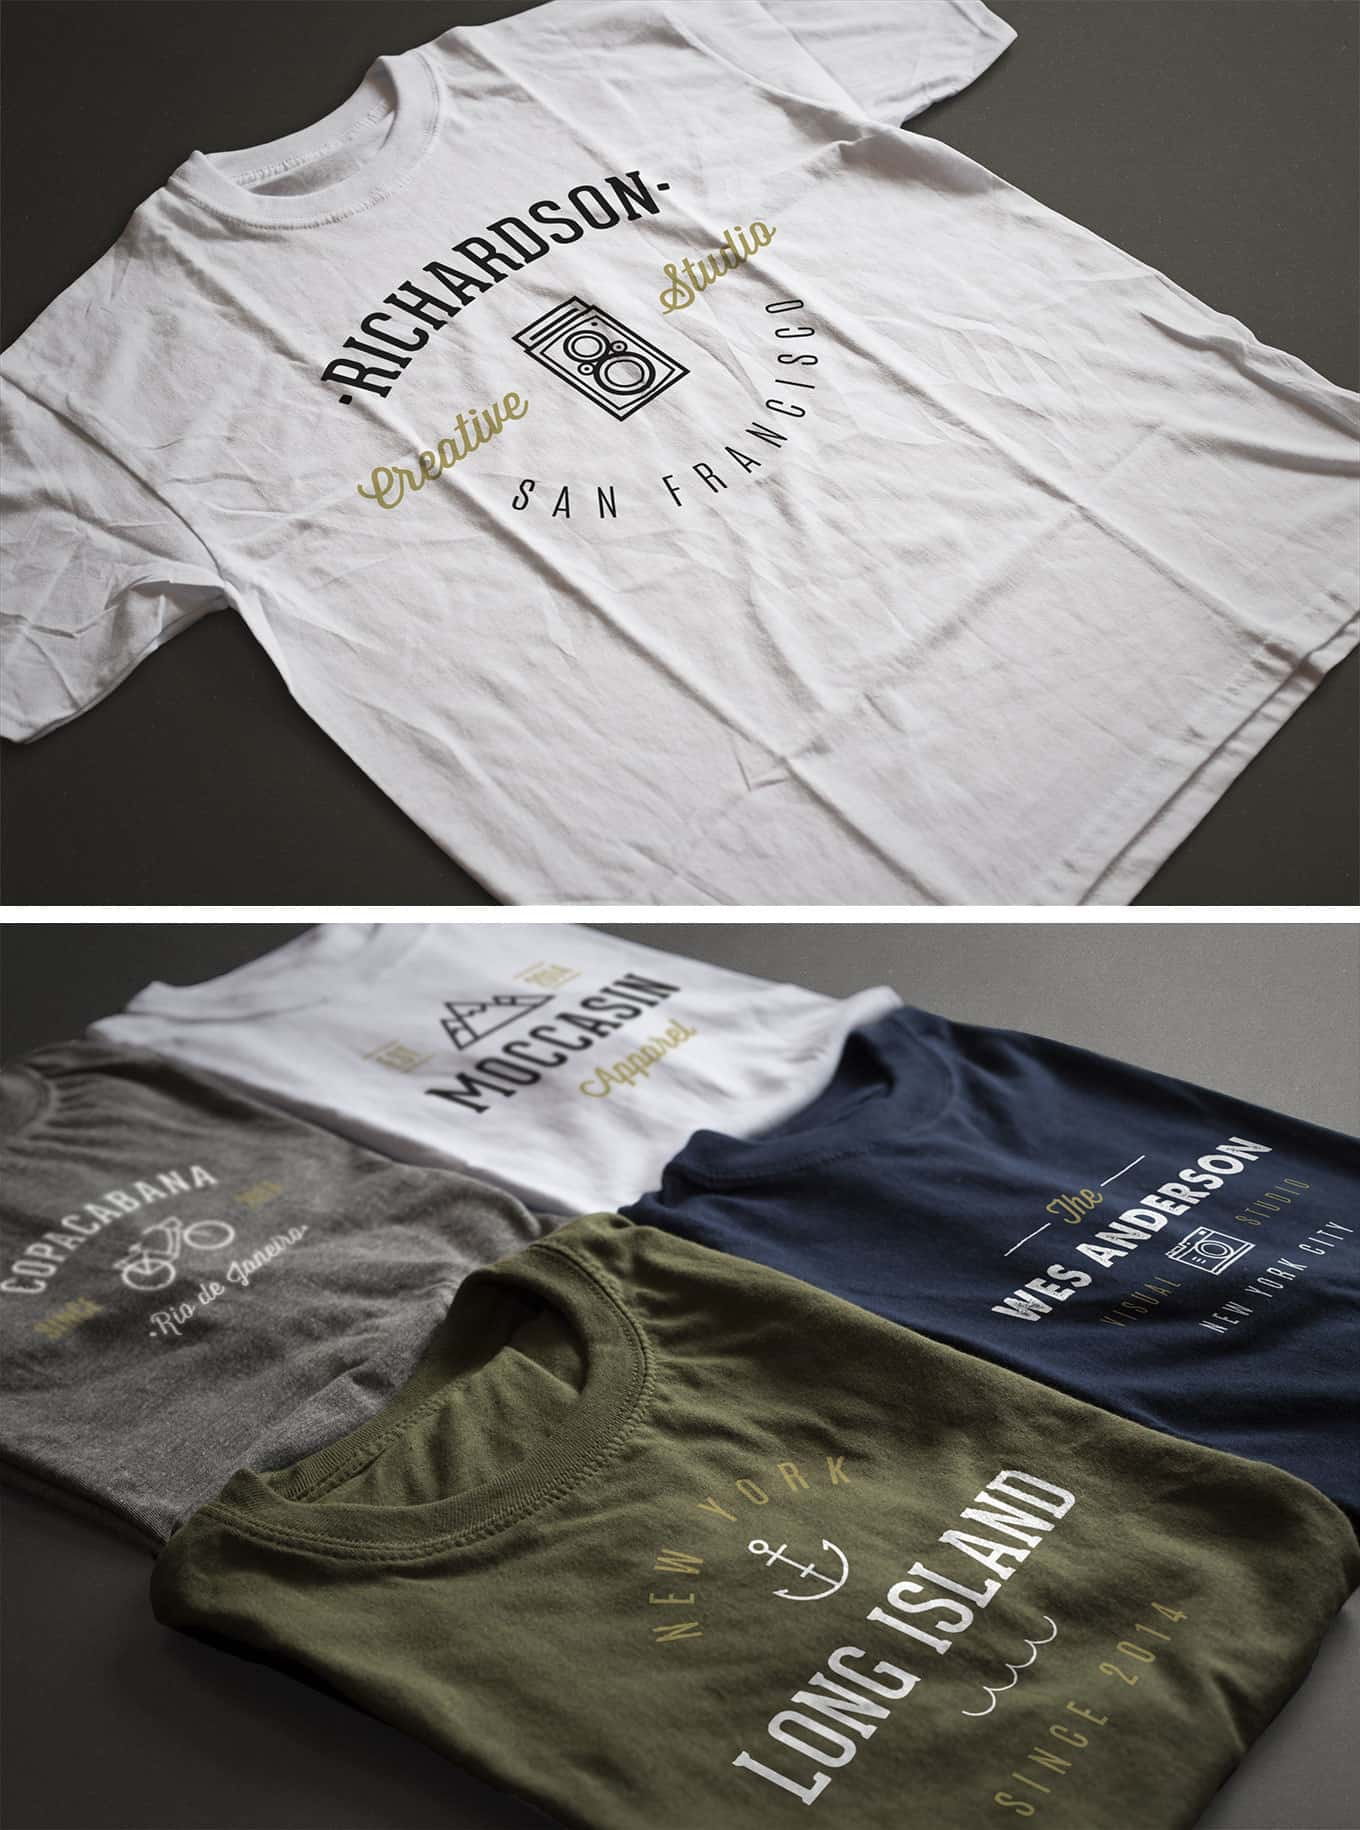 Mockup-playera-gratis-Antonio-Padillas-Photorealistic-T-shirt-templates